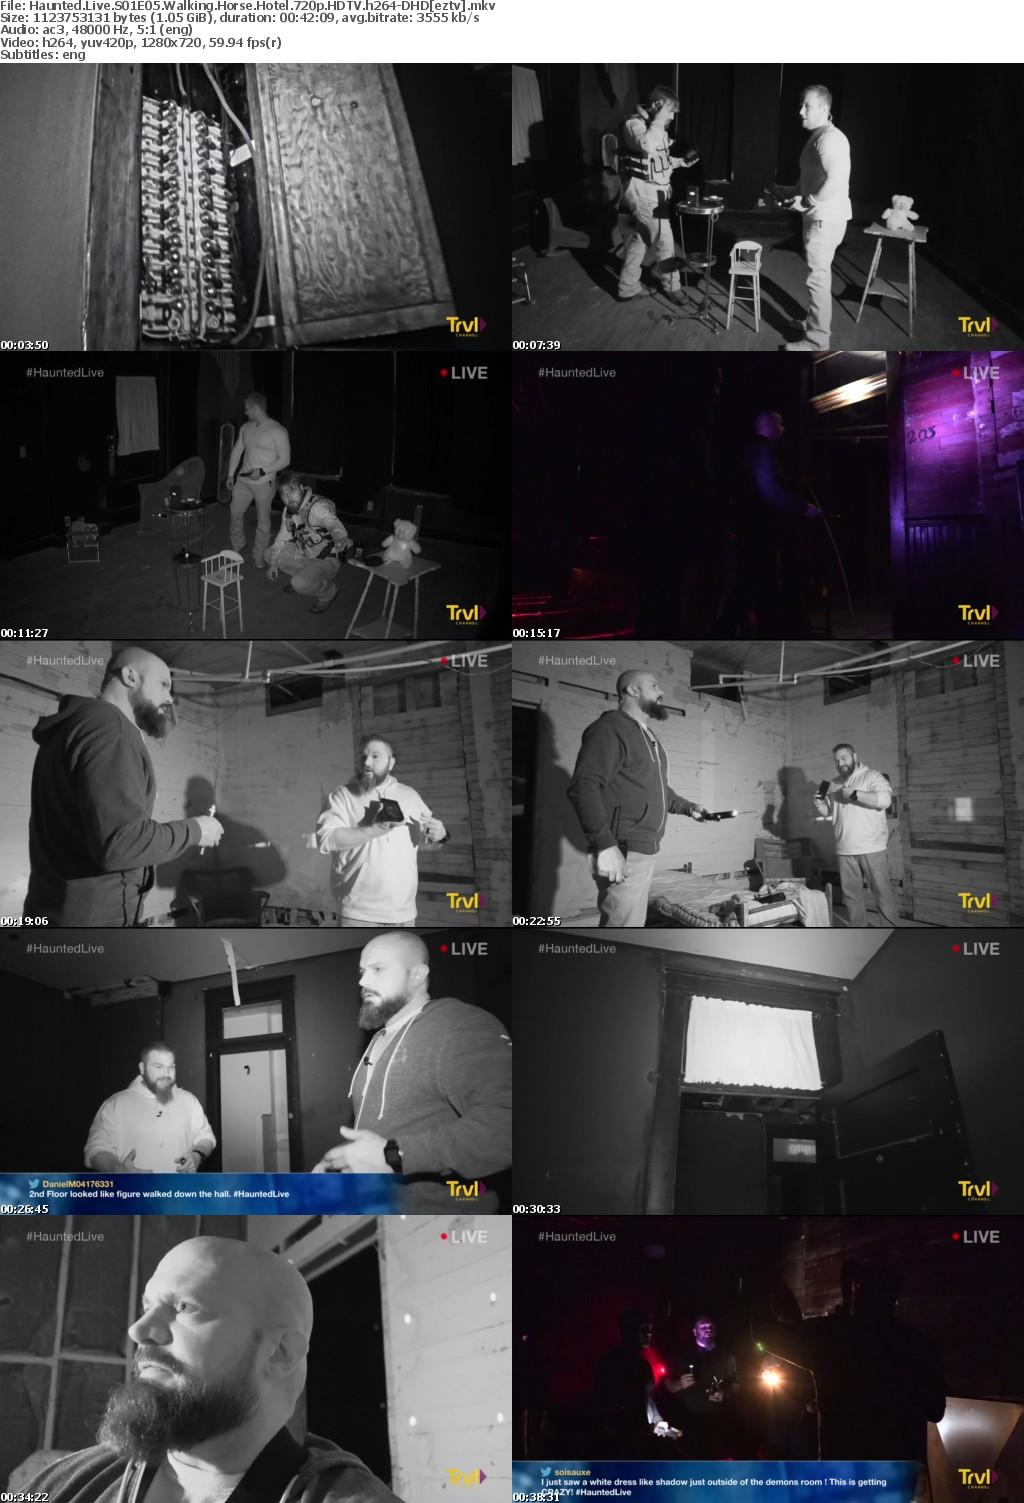 Haunted Live S01E05 Walking Horse Hotel iNTERNAL 720p HDTV h264-DHD